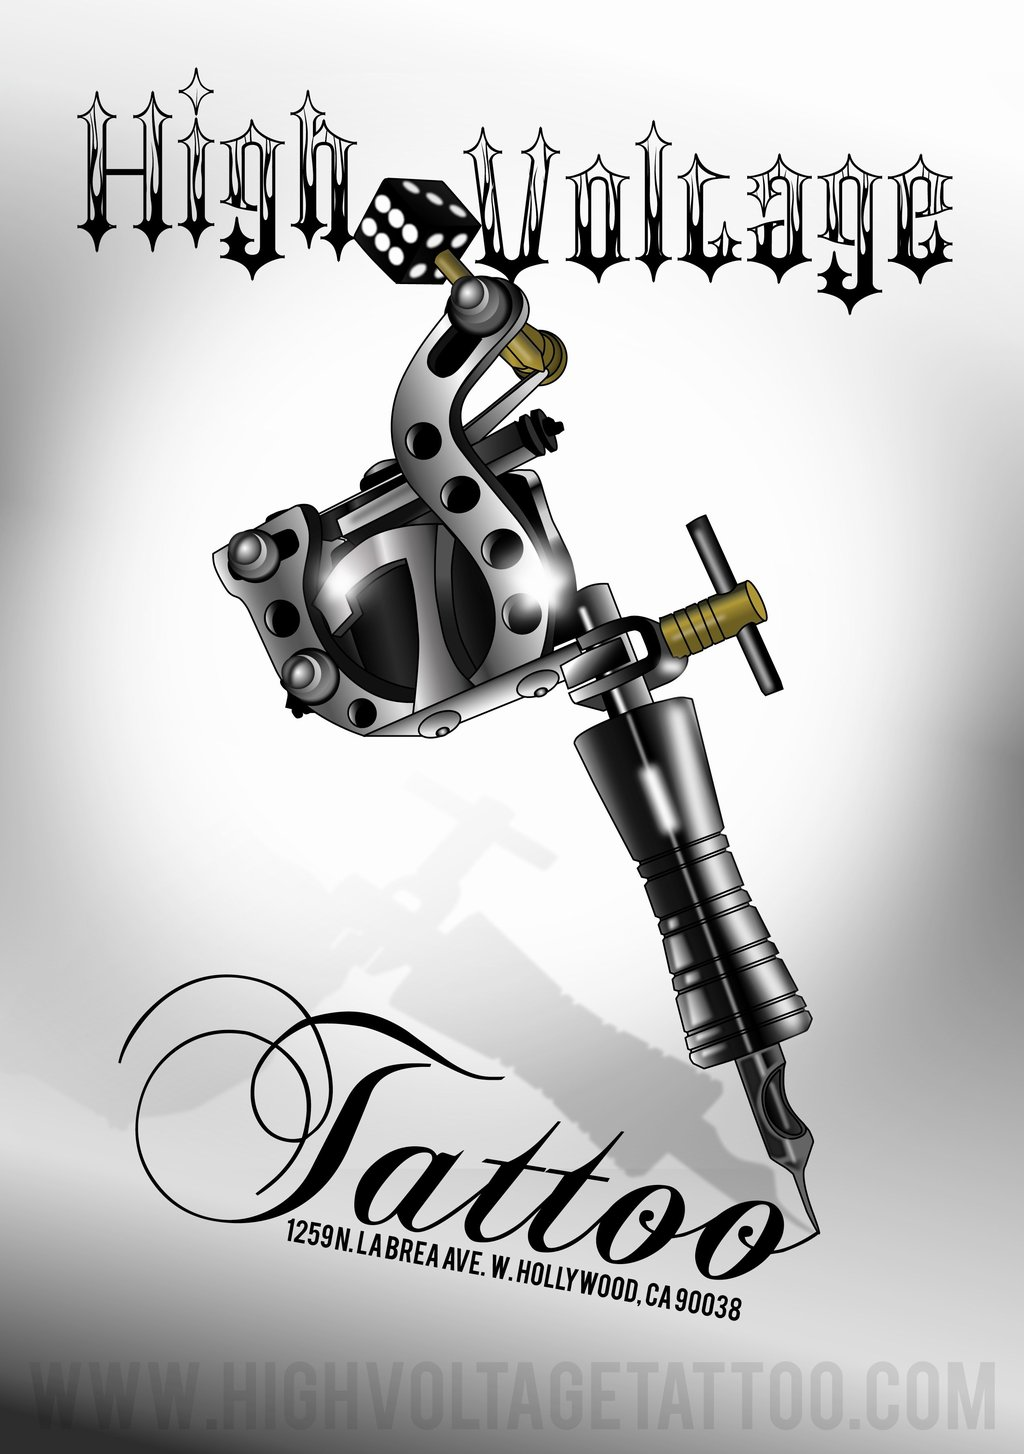 1024x1454 Tattoo Machine By Rocknrollclaire